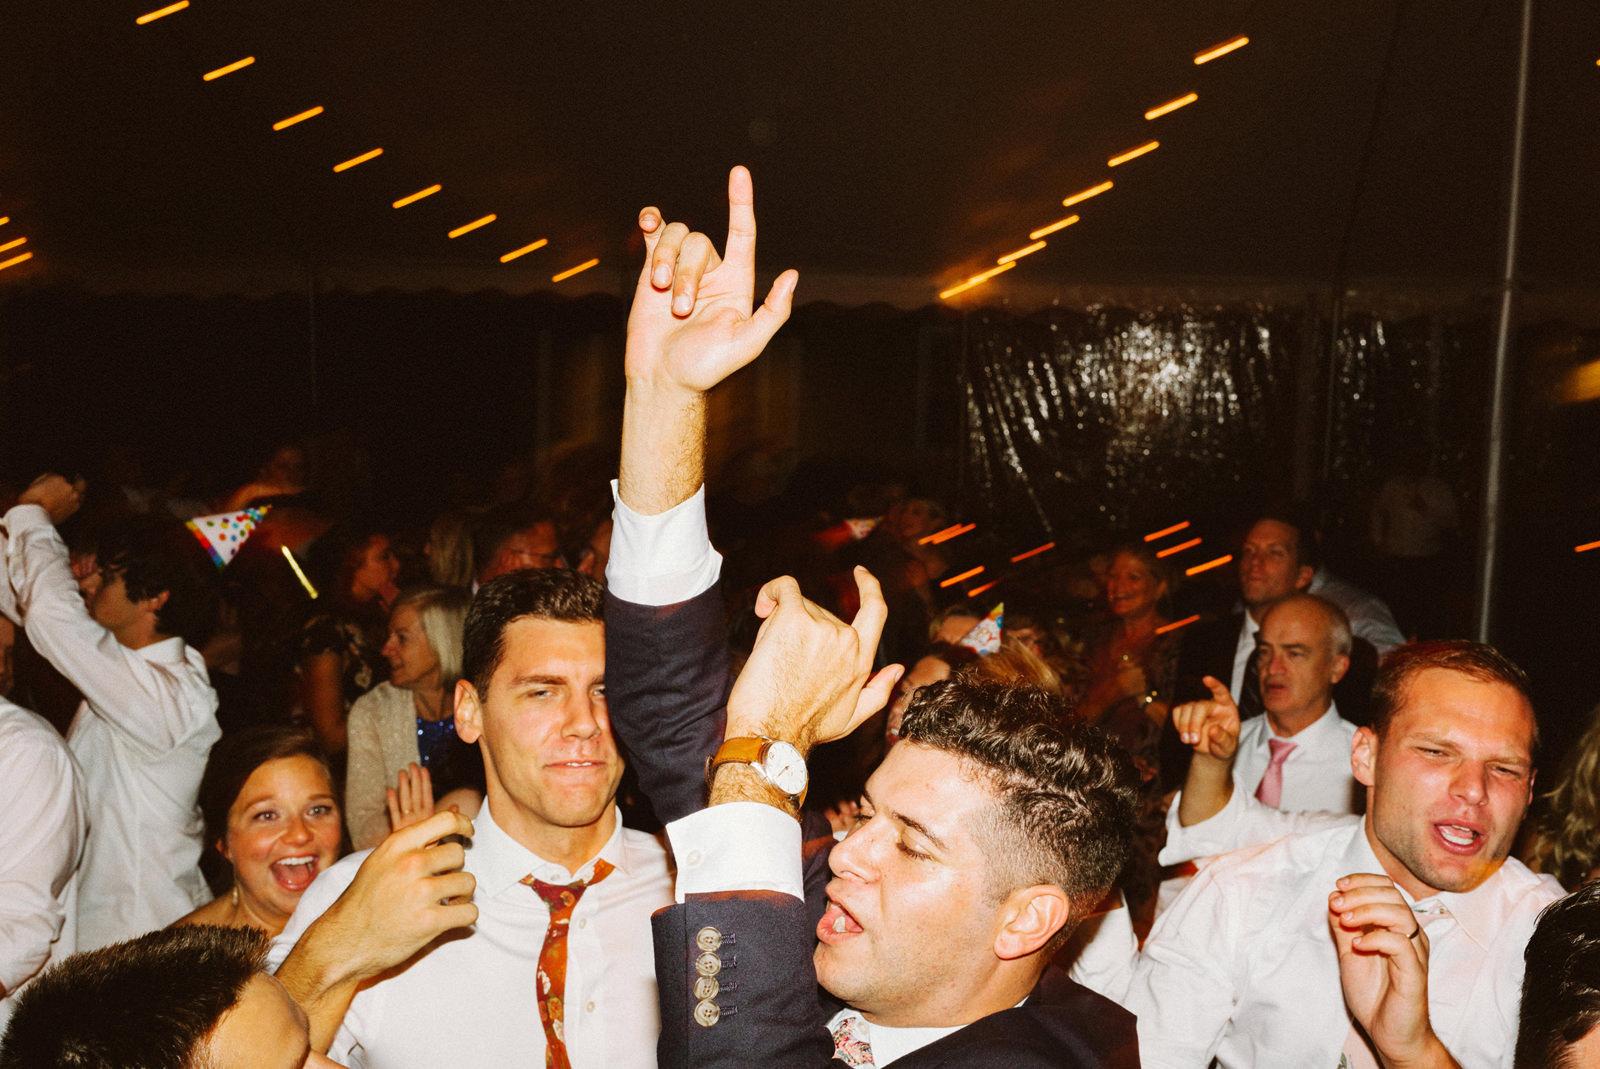 bridgeport-wedding-174 BRIDGEPORT, CONNECTICUT BACKYARD WEDDING